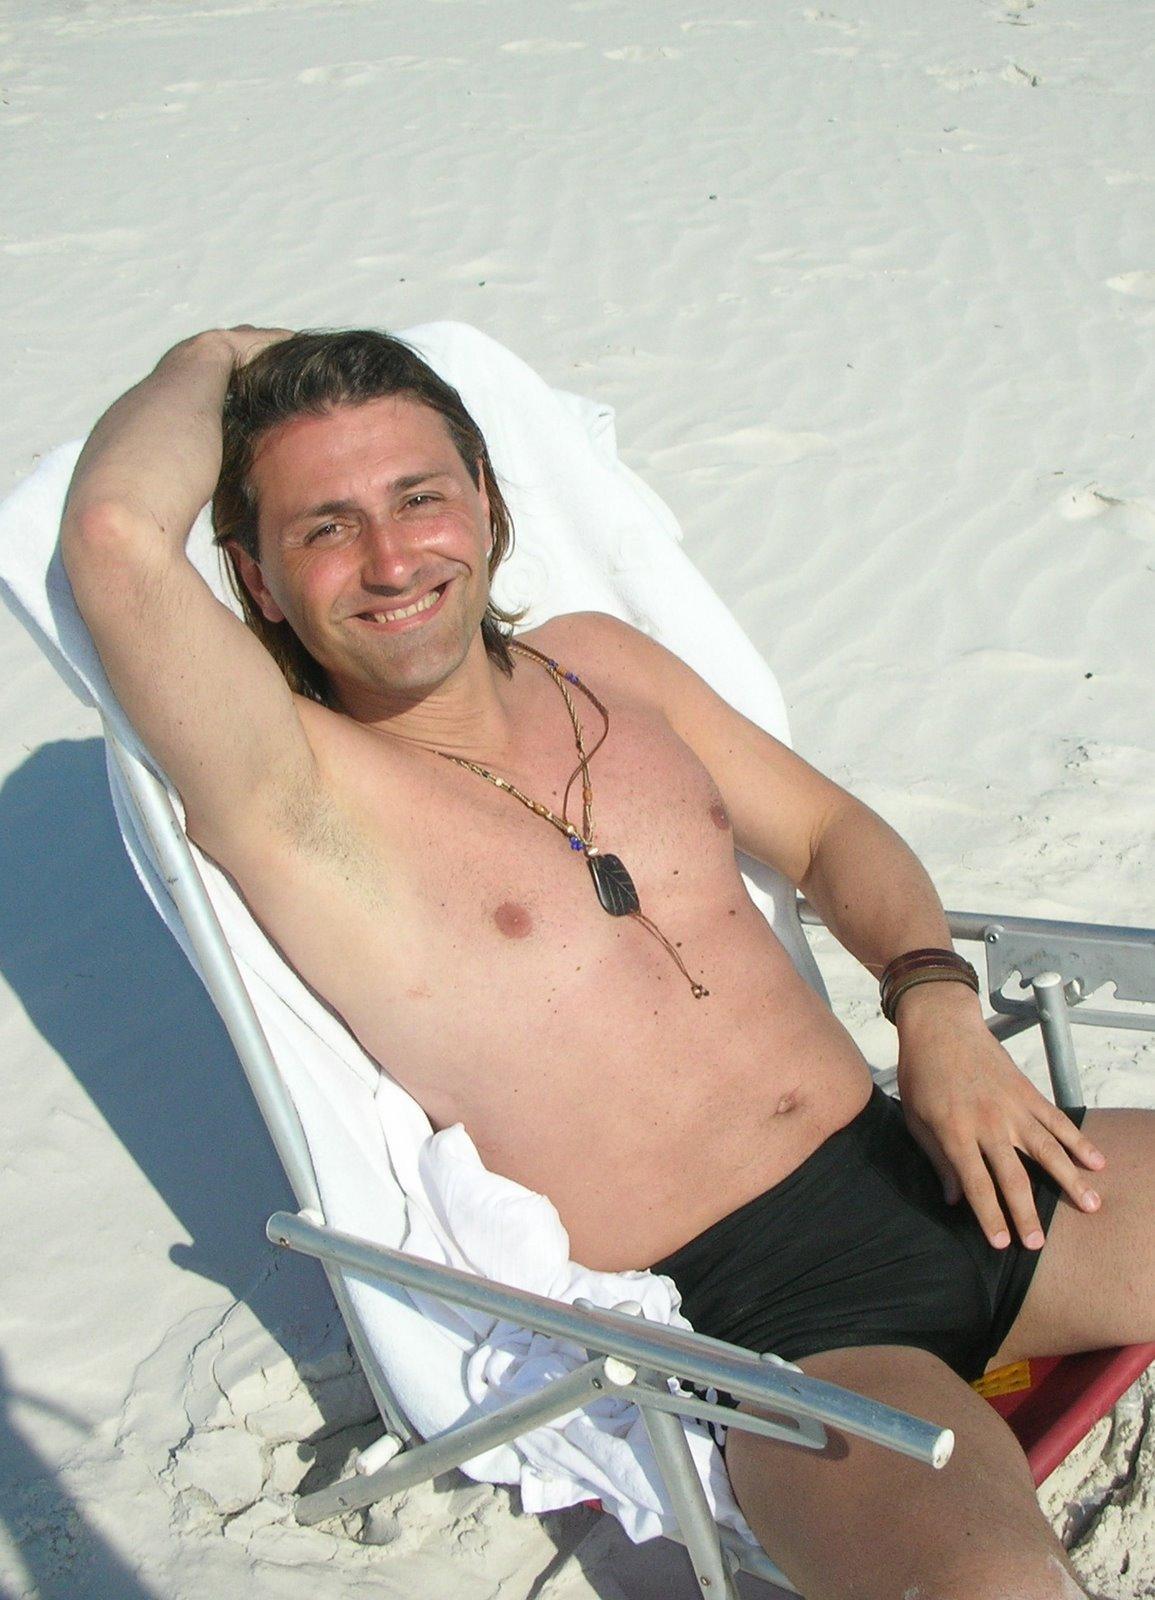 http://4.bp.blogspot.com/_zDl54oPKf_8/SwiH_a7gMMI/AAAAAAAAFAY/KcpXLWPulr8/s1600/daniel+gomez+rinaldi+sexy+sunga+zunga.jpg